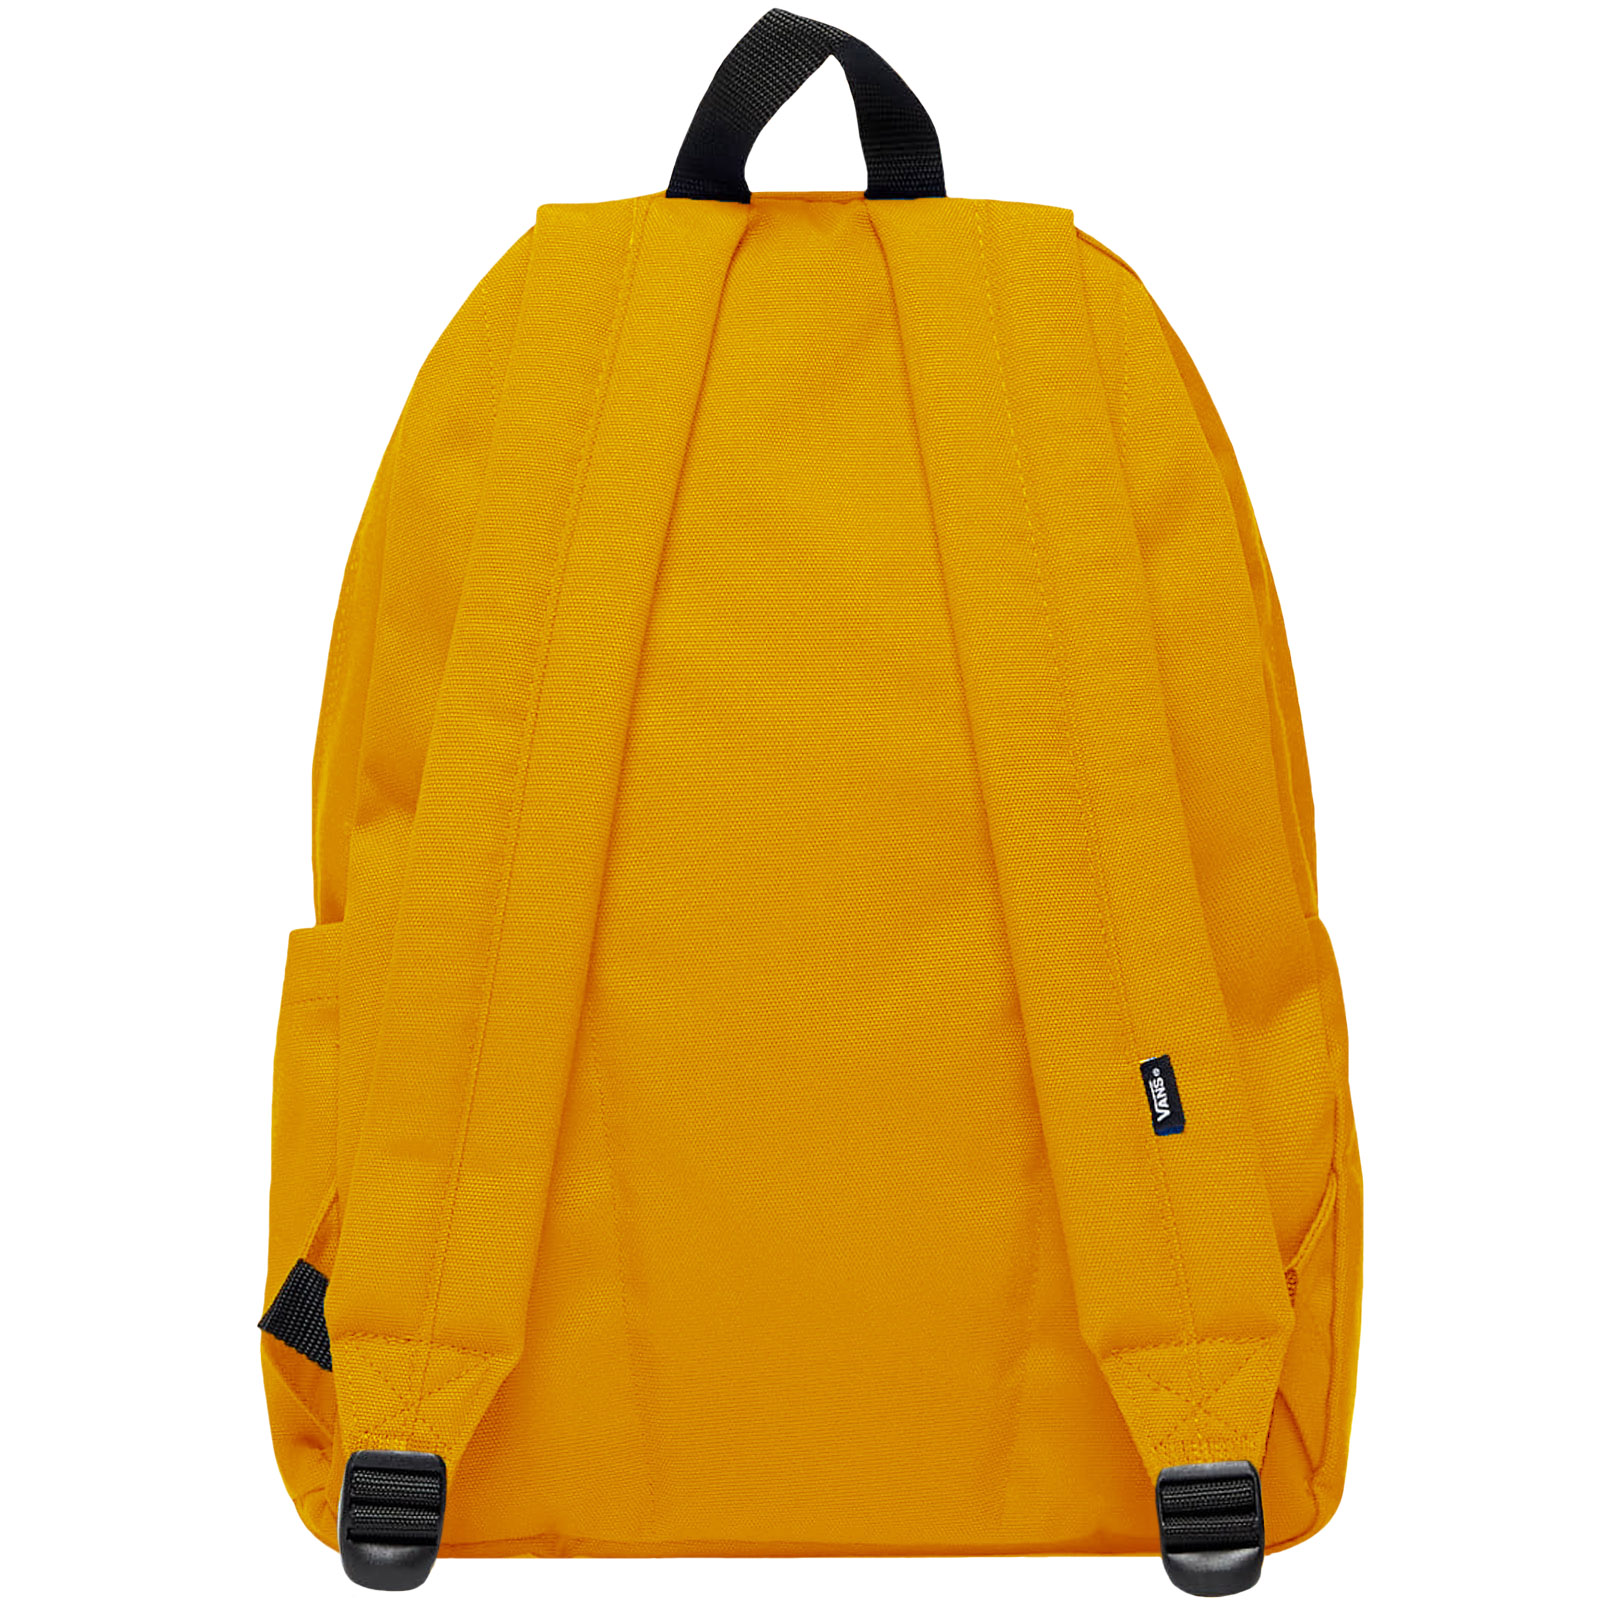 thumbnail 9 - Vans Unisex Old Skool Drop Adjustable Strap School Travel Rucksack Backpack Bag